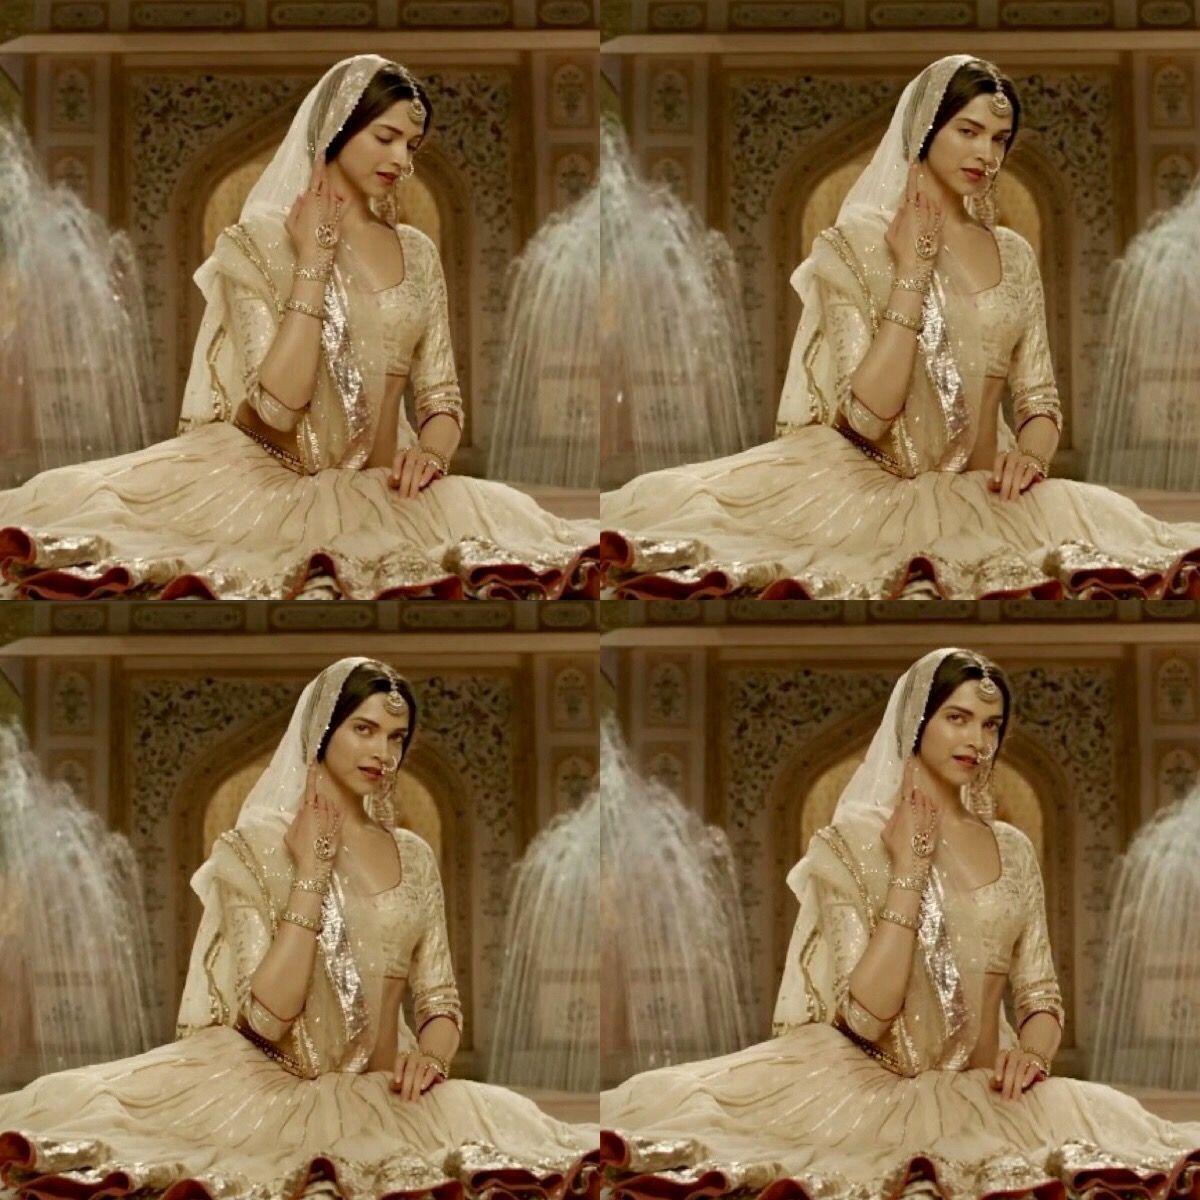 Rajput wedding dress  Deepika Padukone in Bajirao Mastani  Deepika Padukone  Pinterest